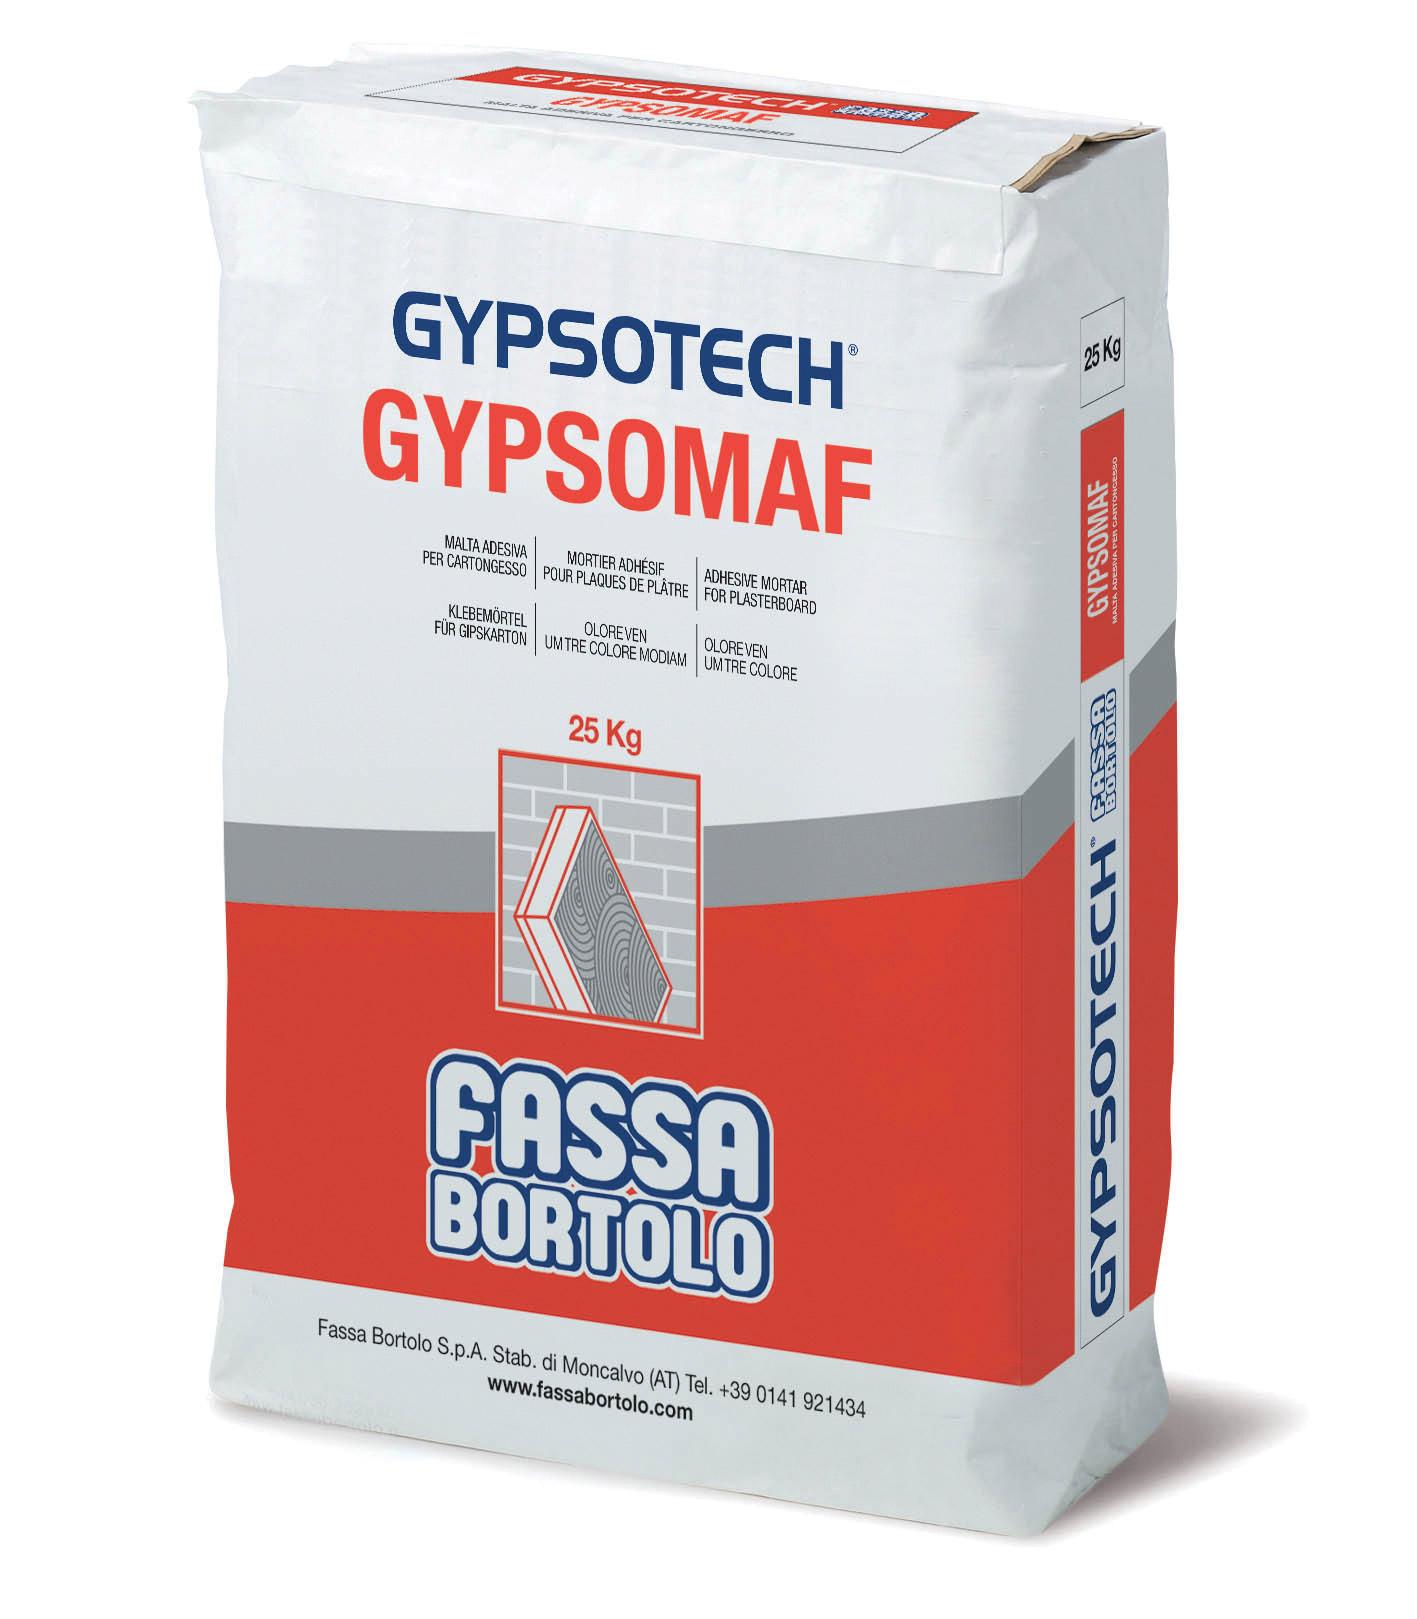 GYPSOMAF: Malta adesiva per cartongesso